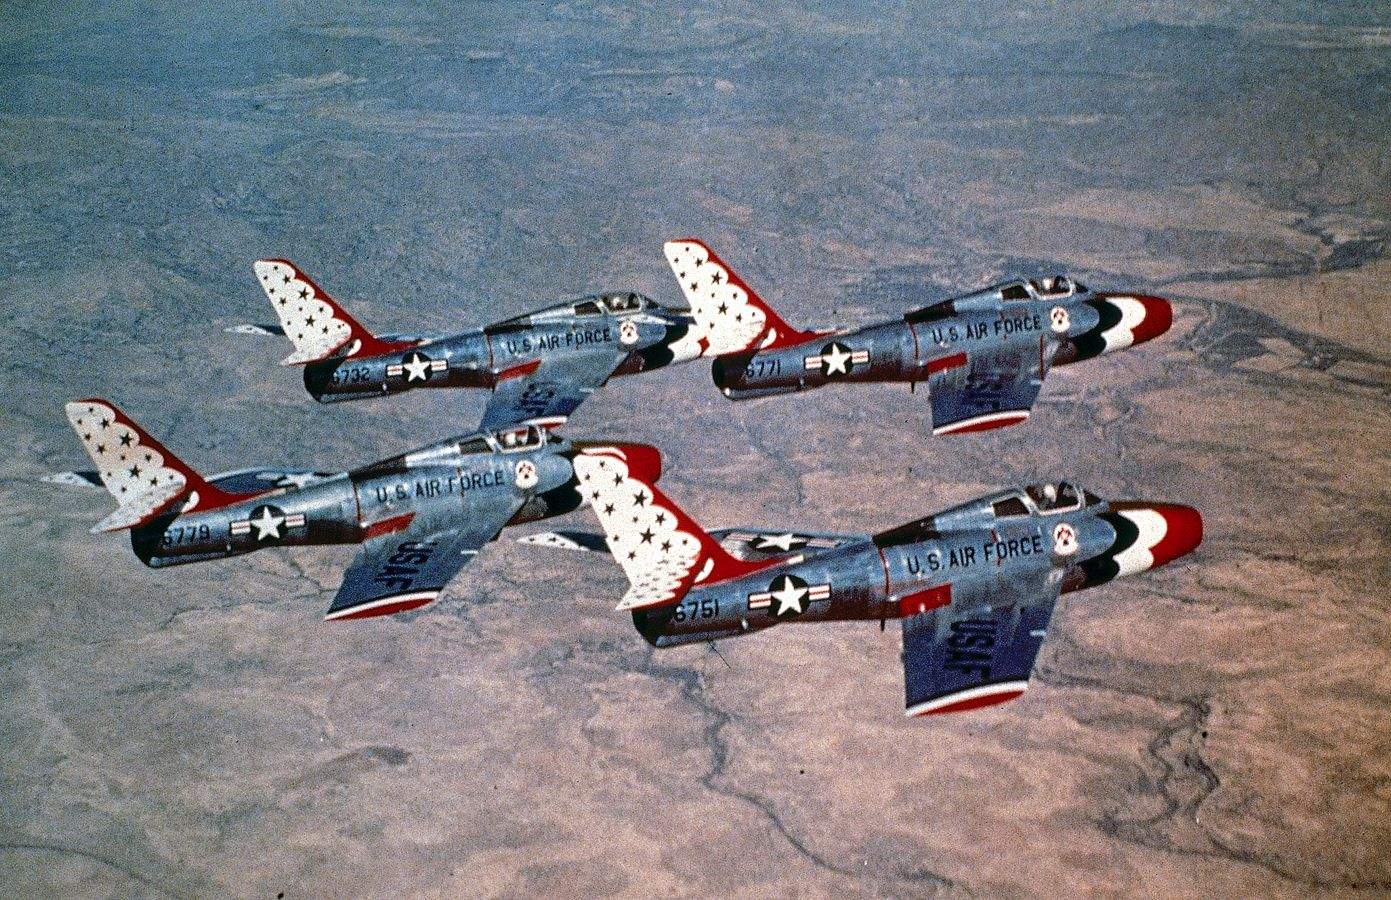 USAF Thunderbirds, mid 50's F84 Thunderstreak Aircraft